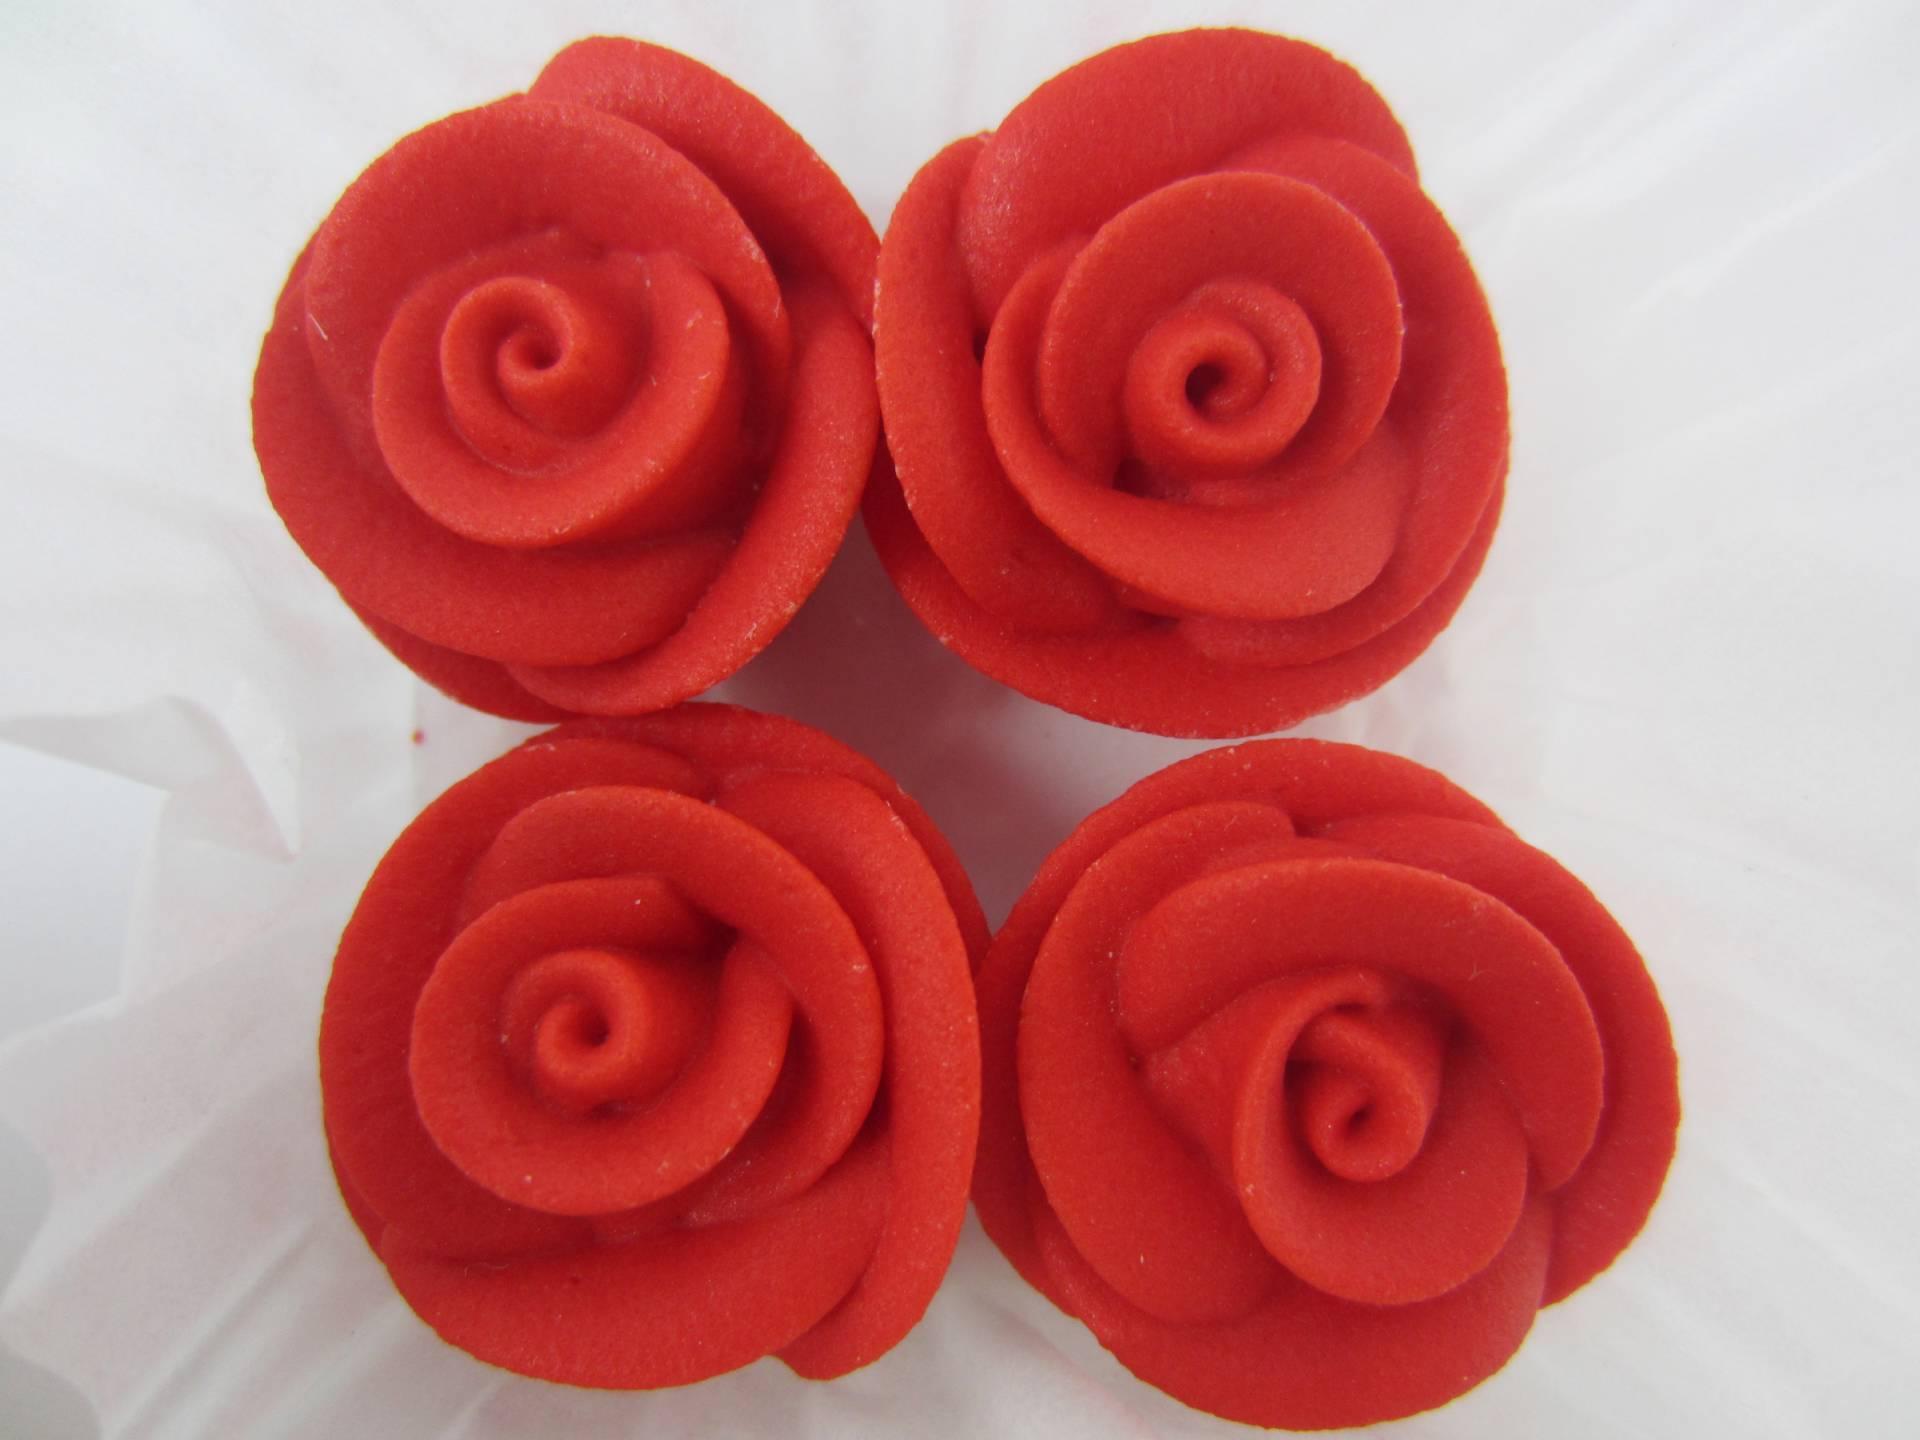 24xEdible RED Roses Cupcake Cake Toppers Sugar ...